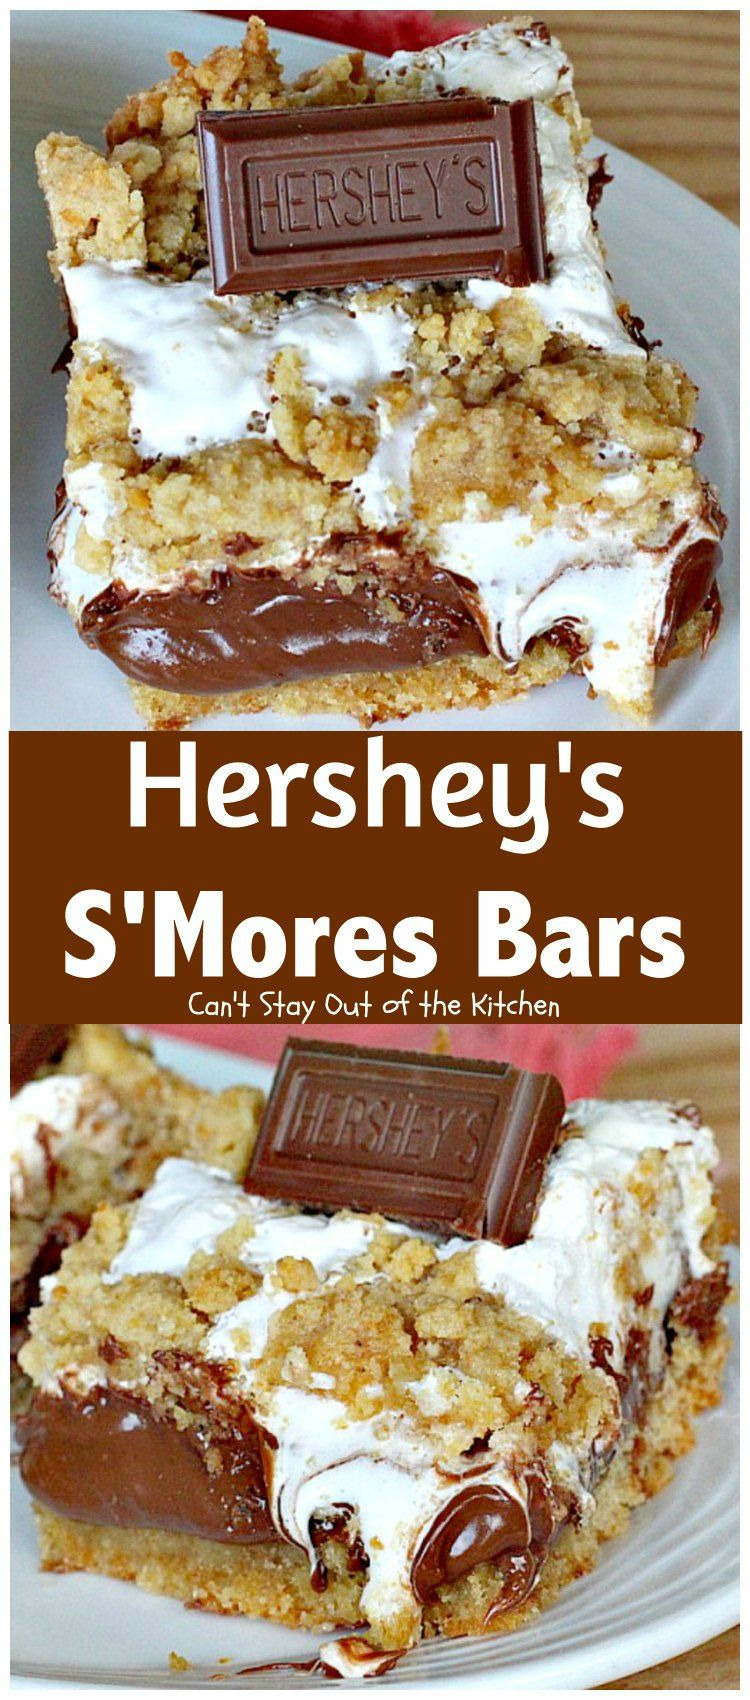 hersheys kitchen recipes - 28 images - hershey s hershey s ...